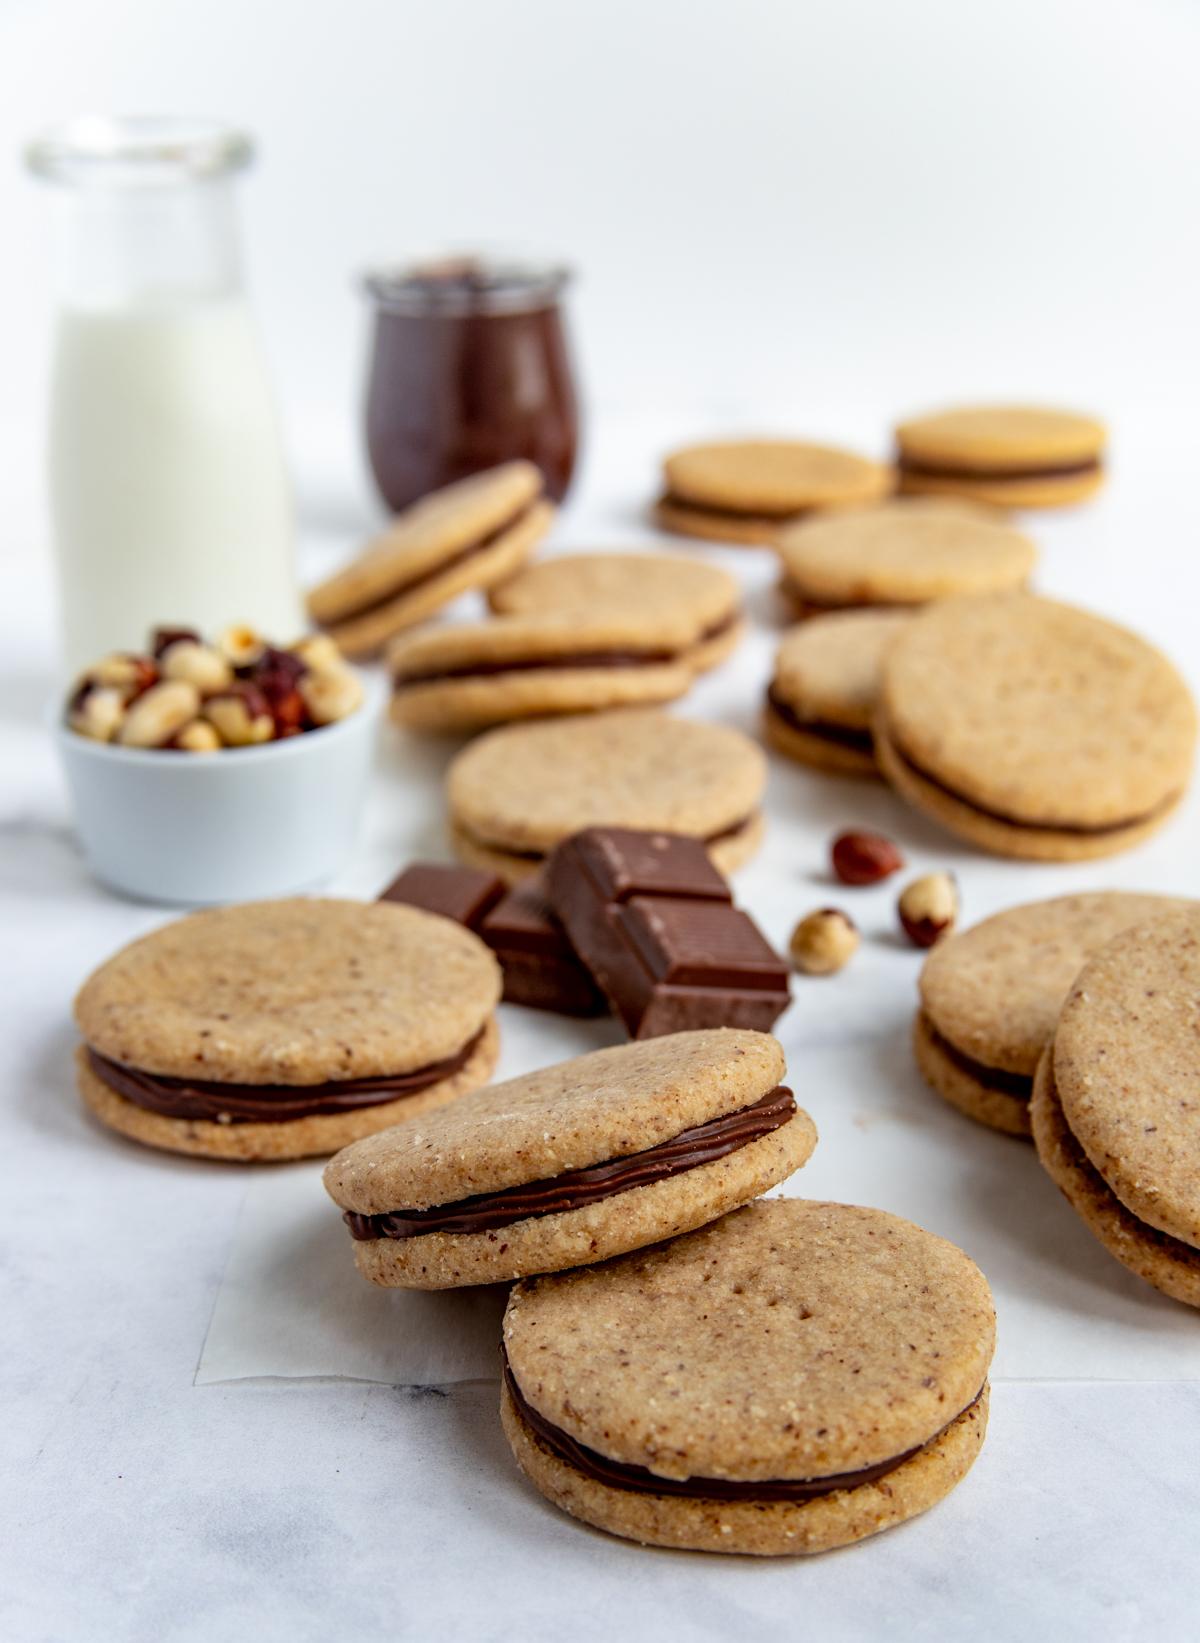 Hazelnut Chocolate Sandwich Cookies next to a class of milk and a bowl of hazelnut cookies